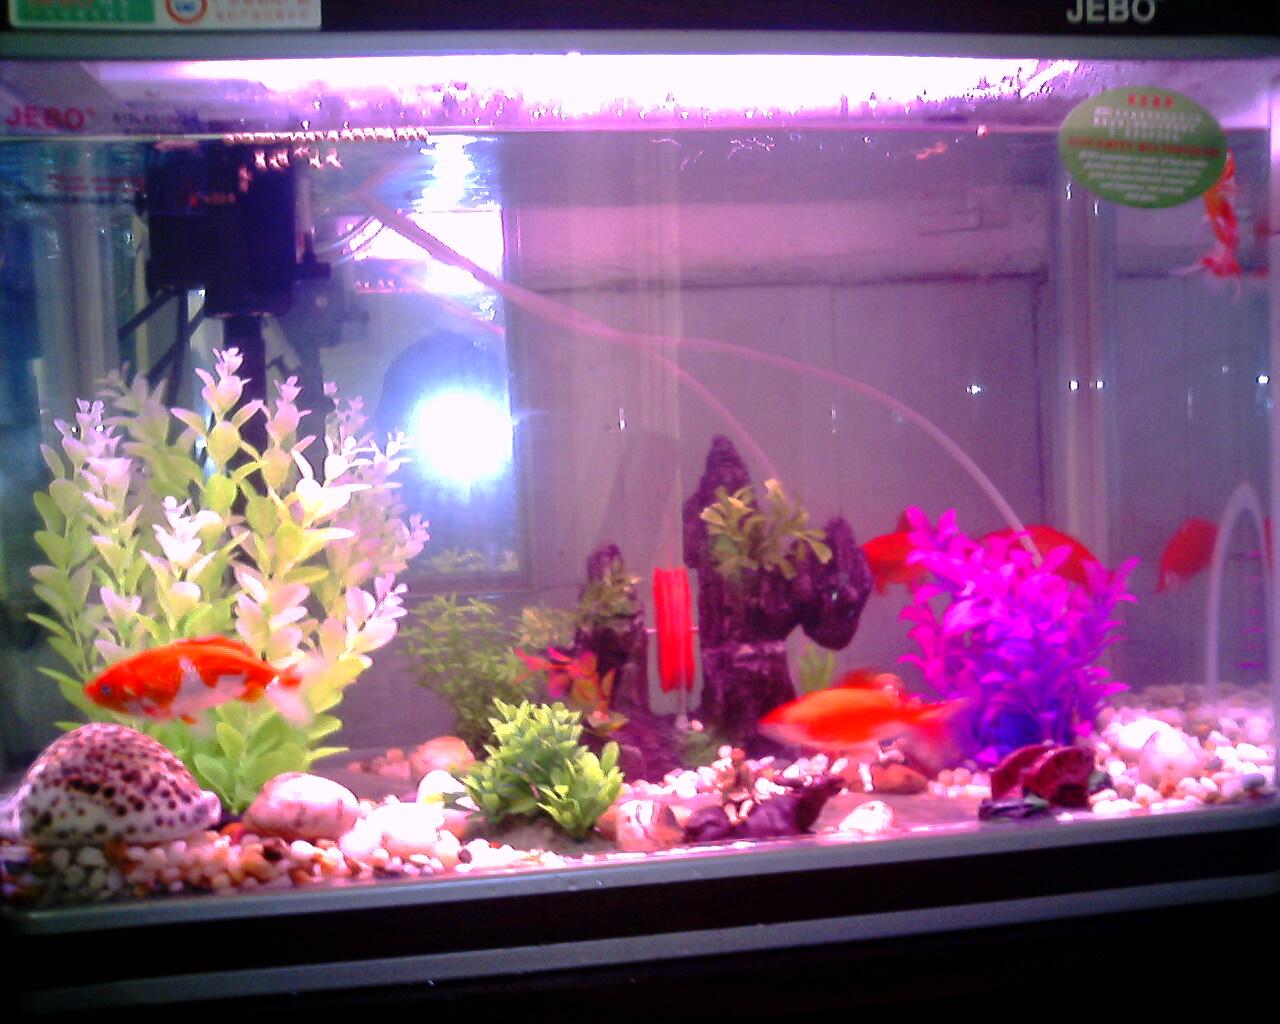 壁纸 动物 罐 鱼 鱼类